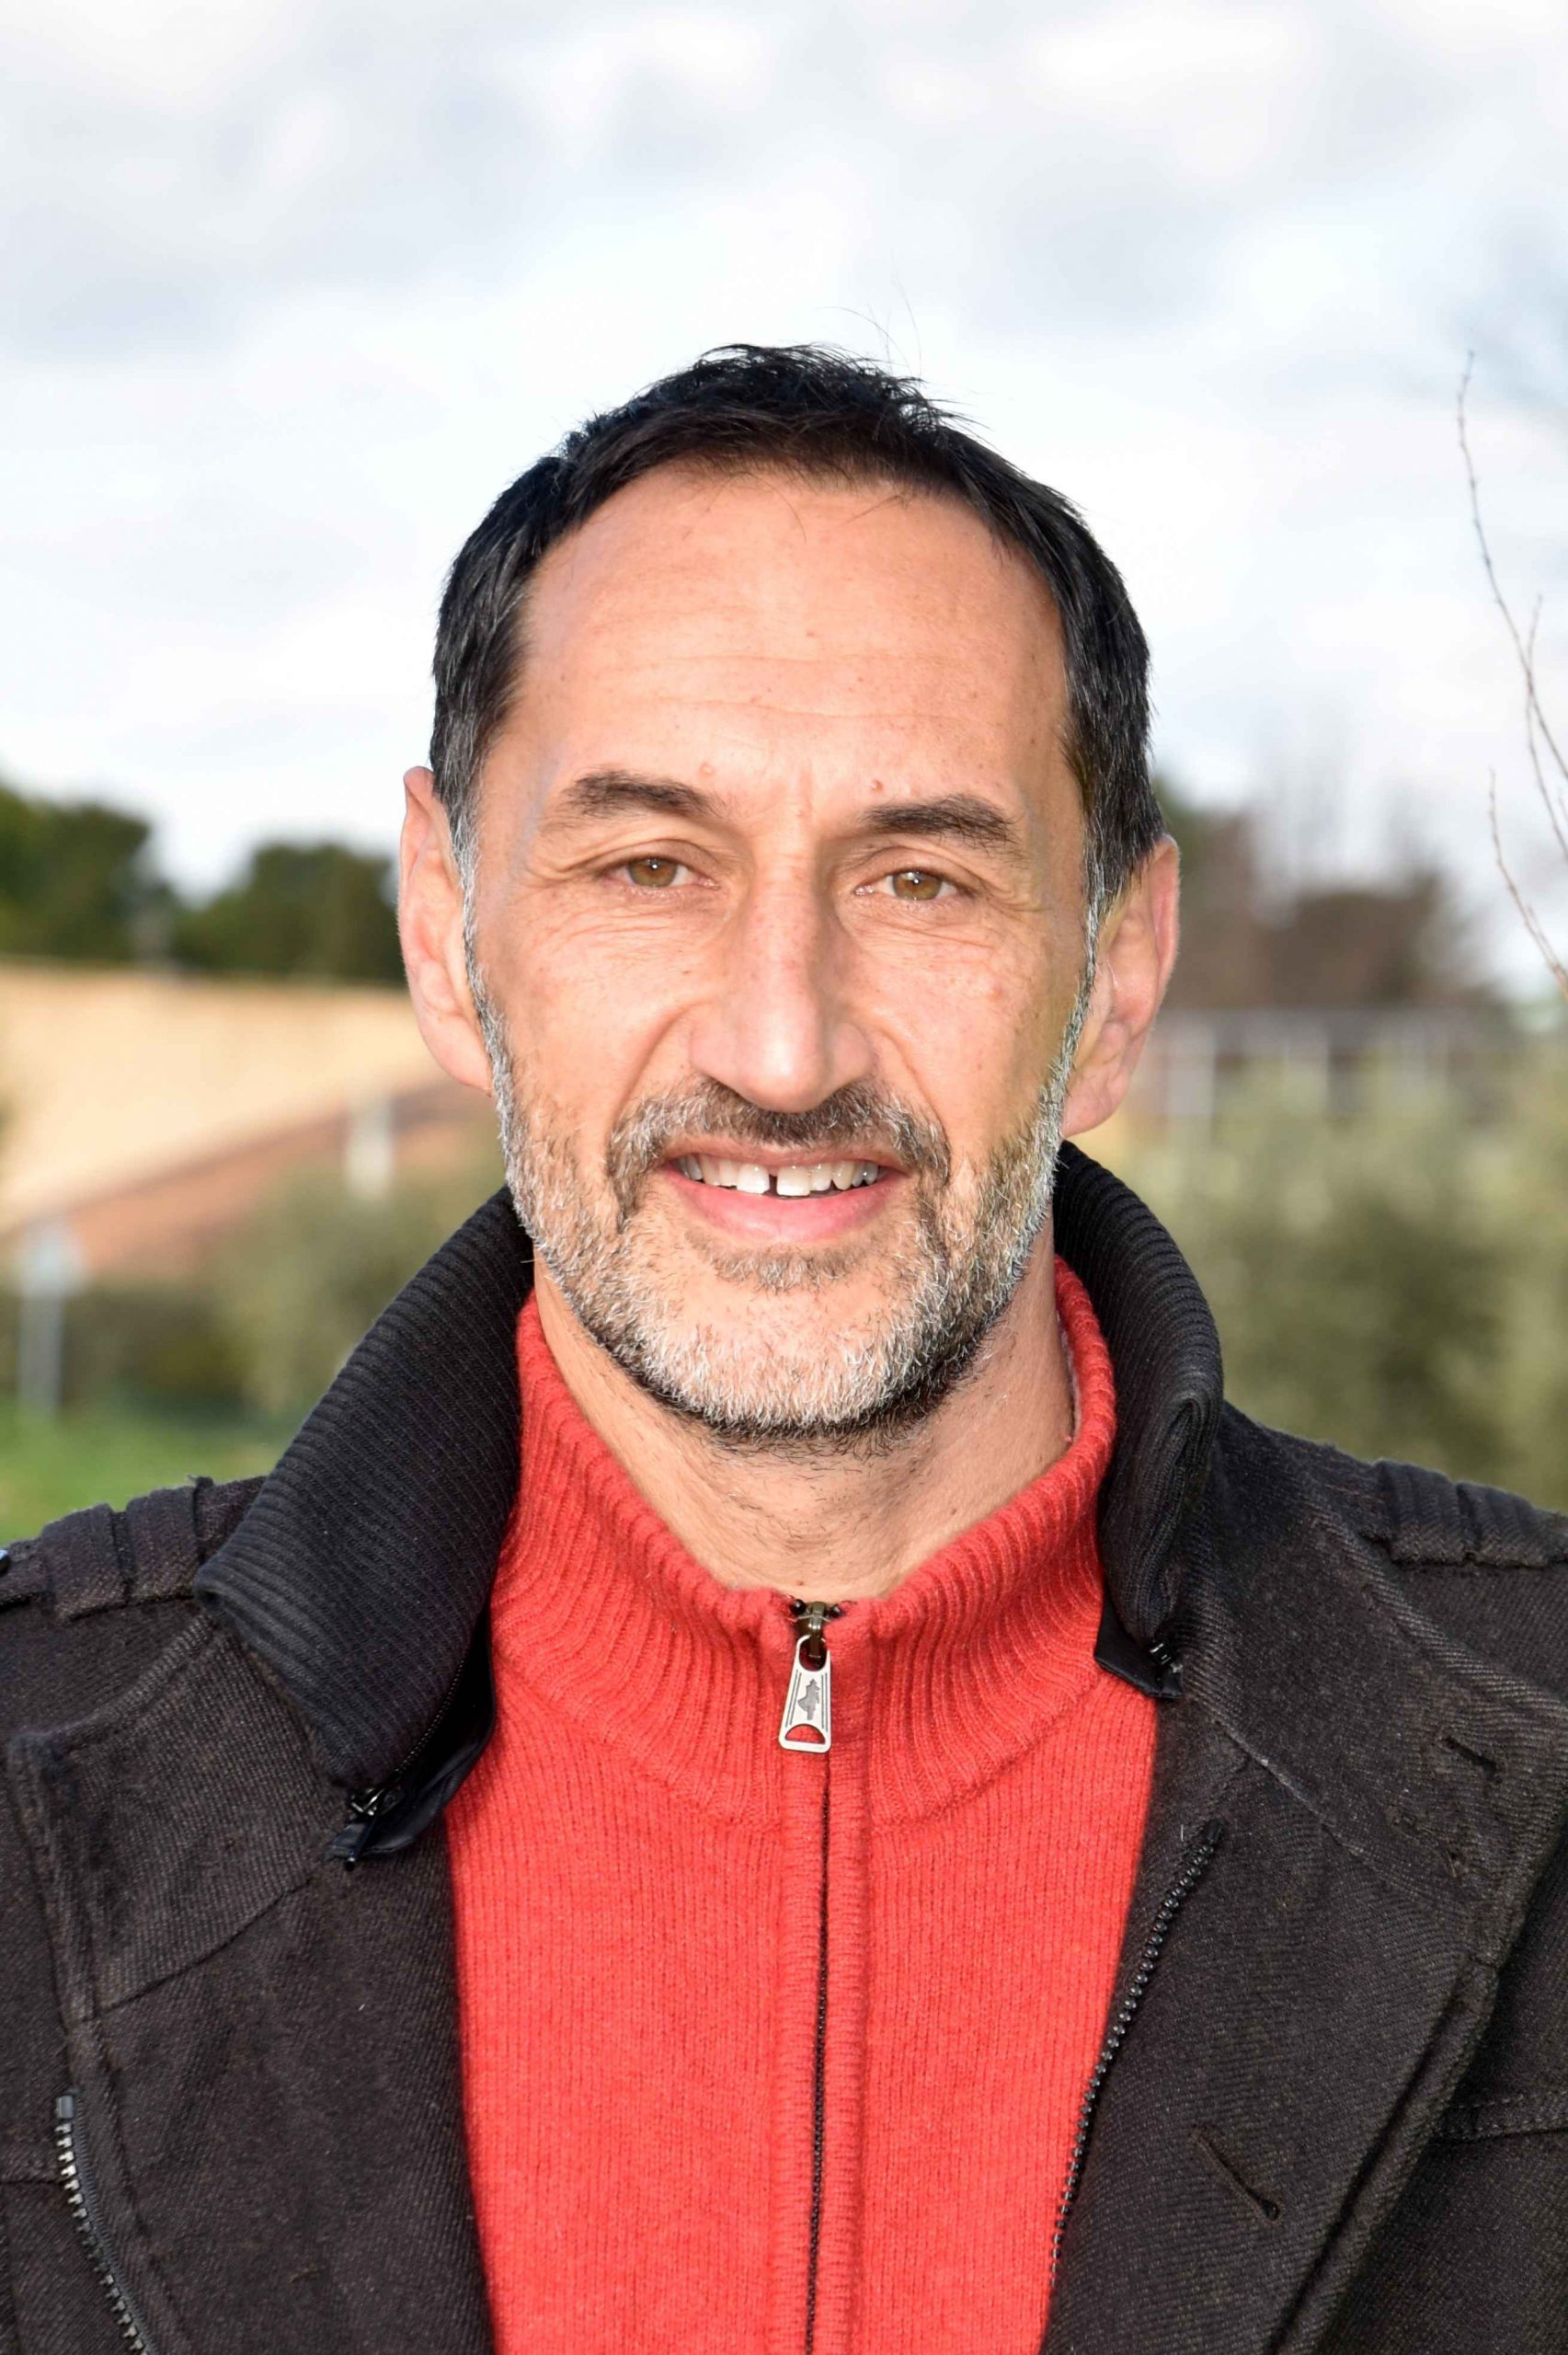 Jérôme Marciliac